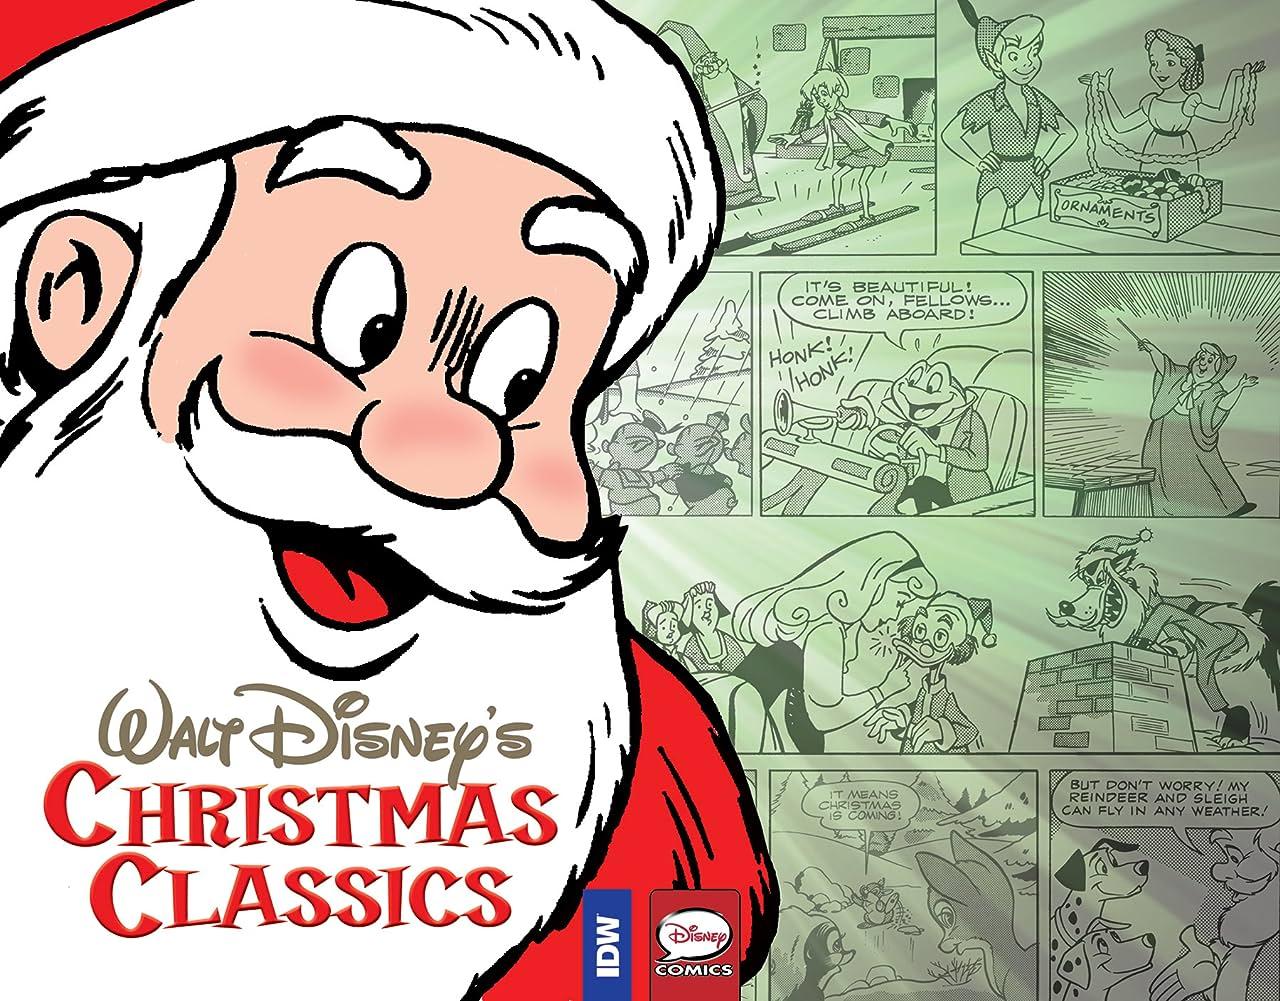 Walt Disney's Christmas Classics